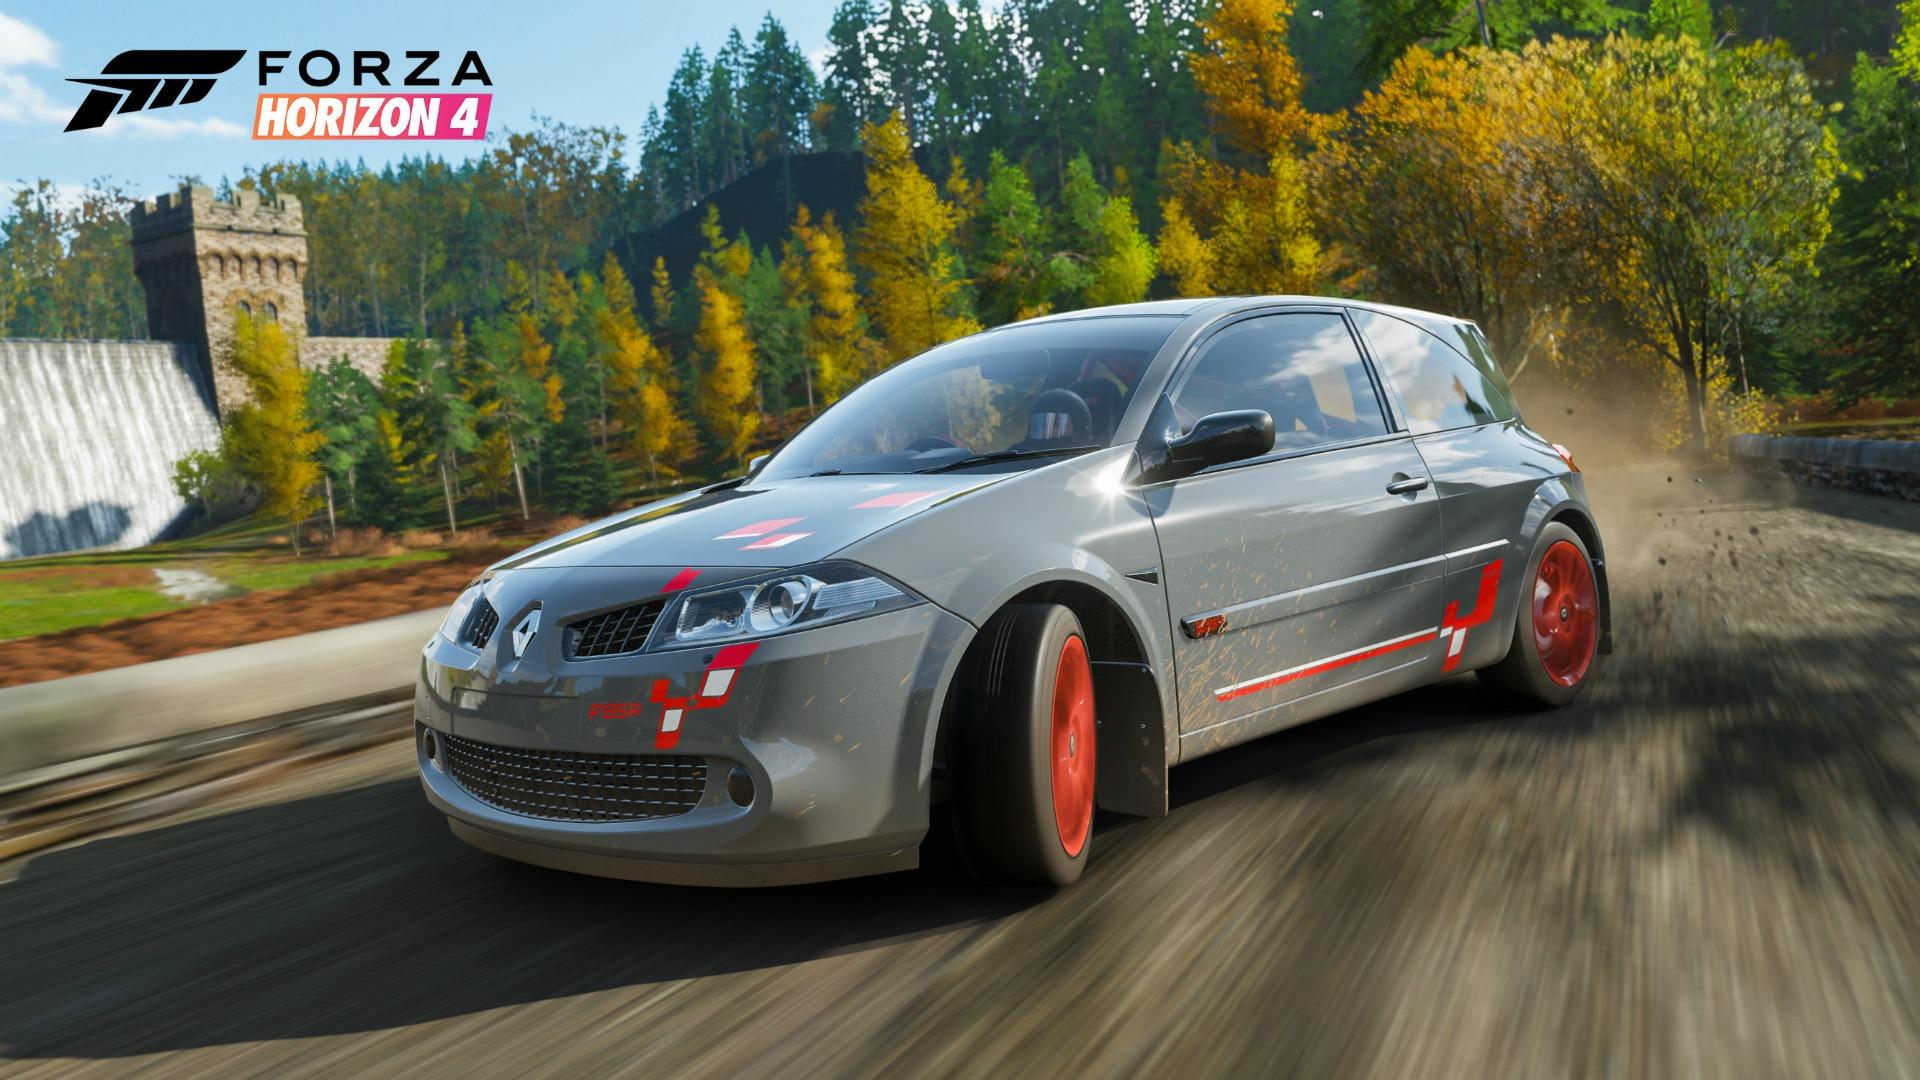 2008 Renault Megane R26R.jpg - Forza Horizon 4